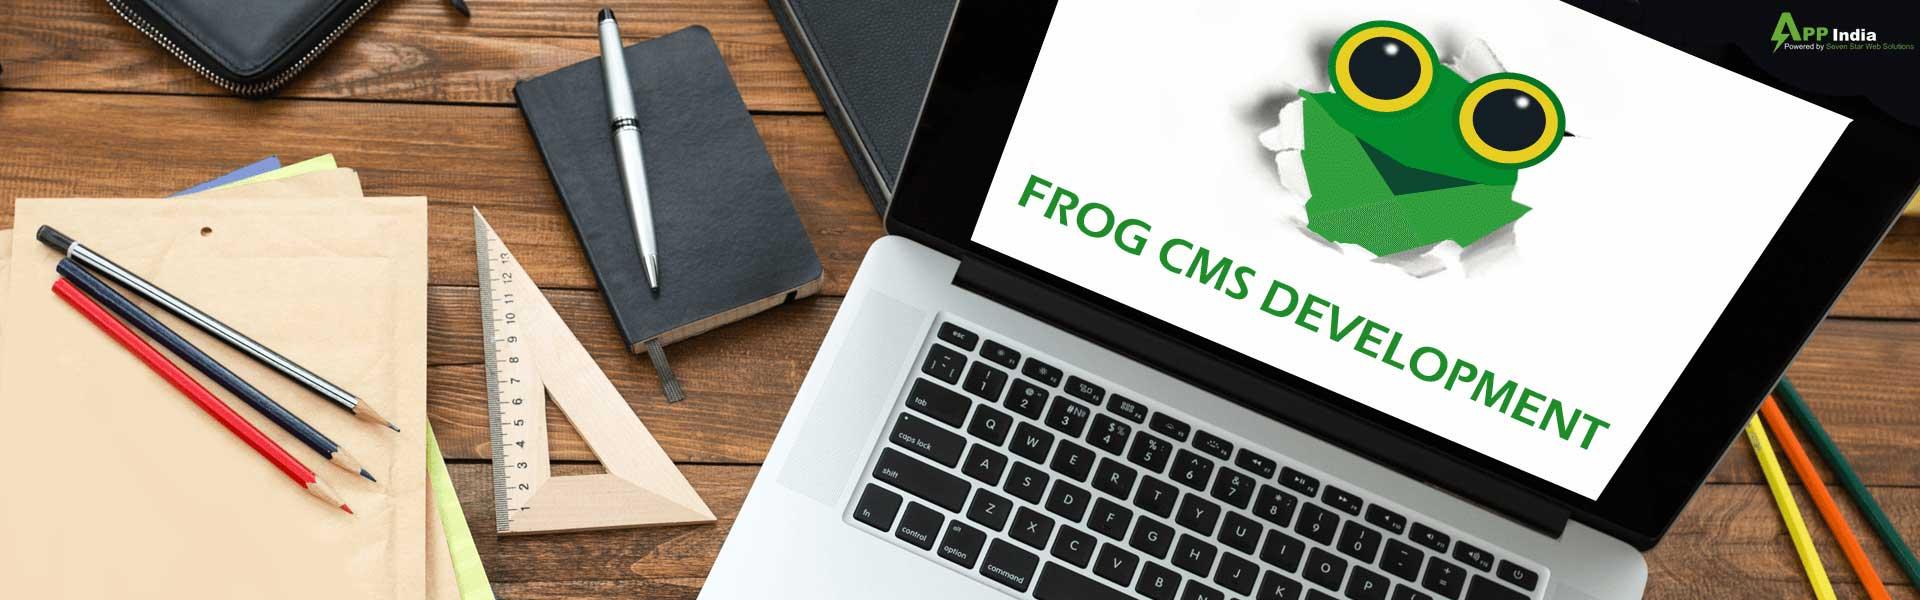 Frog CMS Development